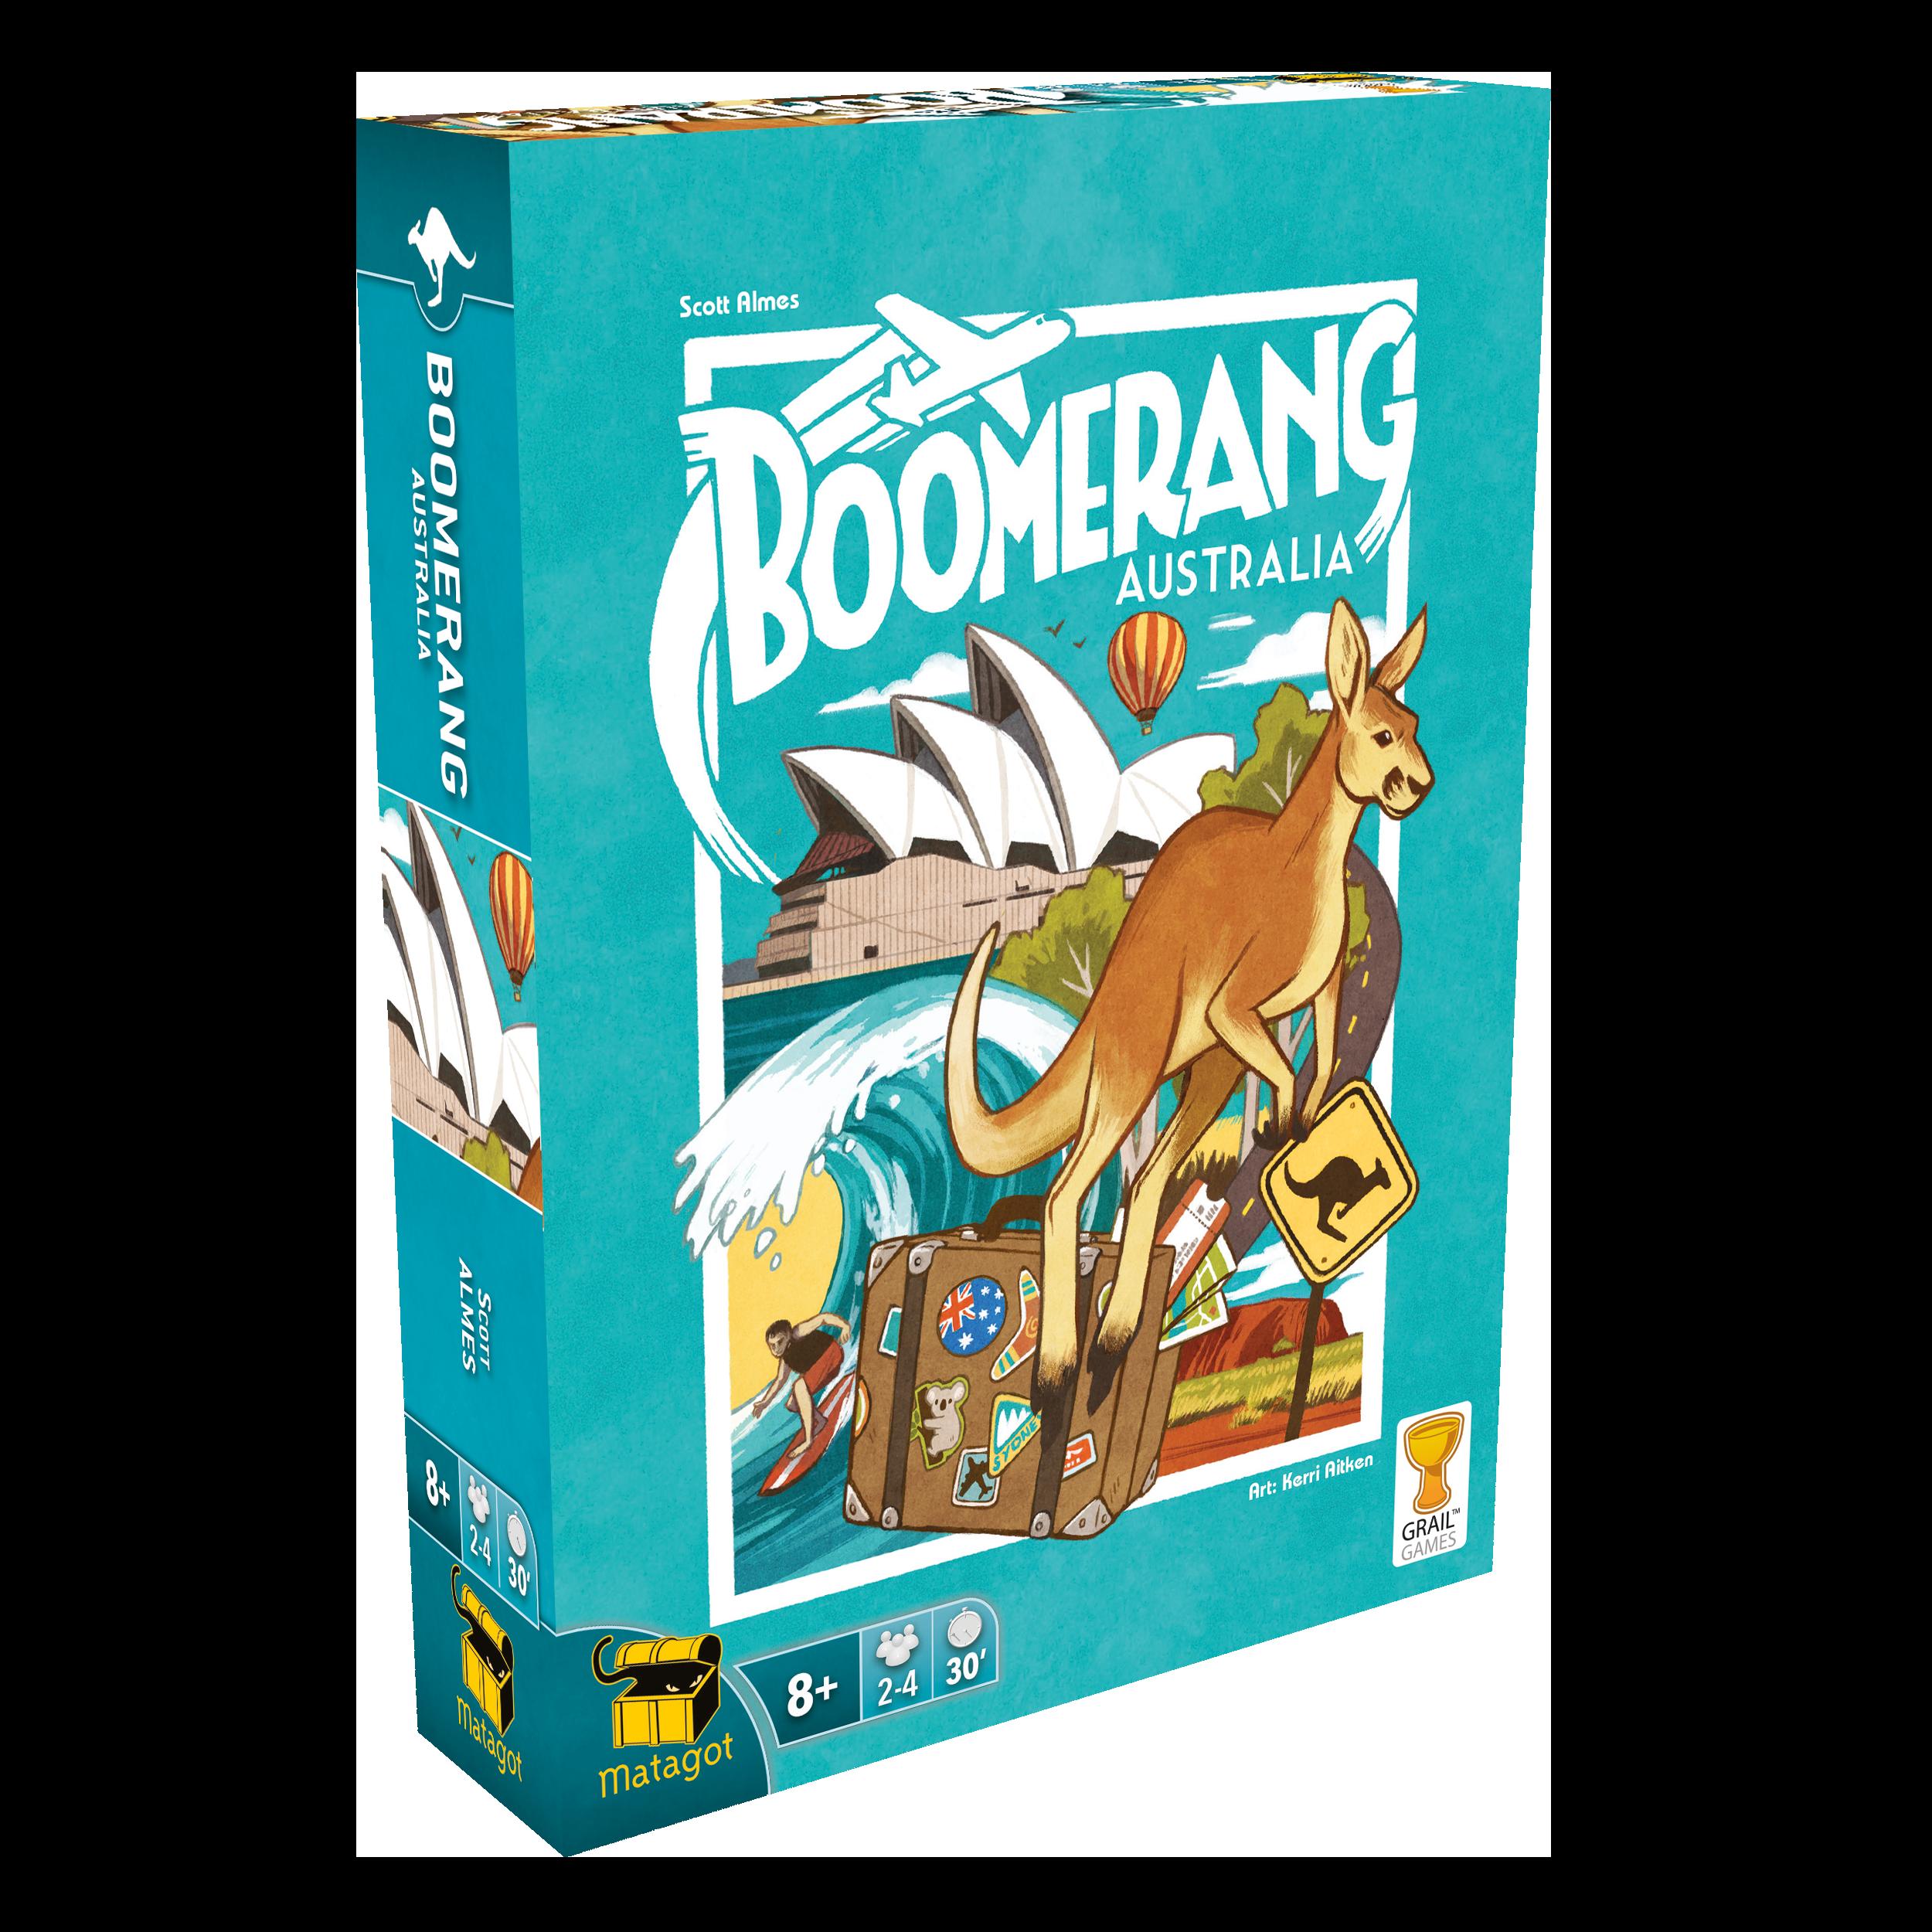 Boomerang_Box3D